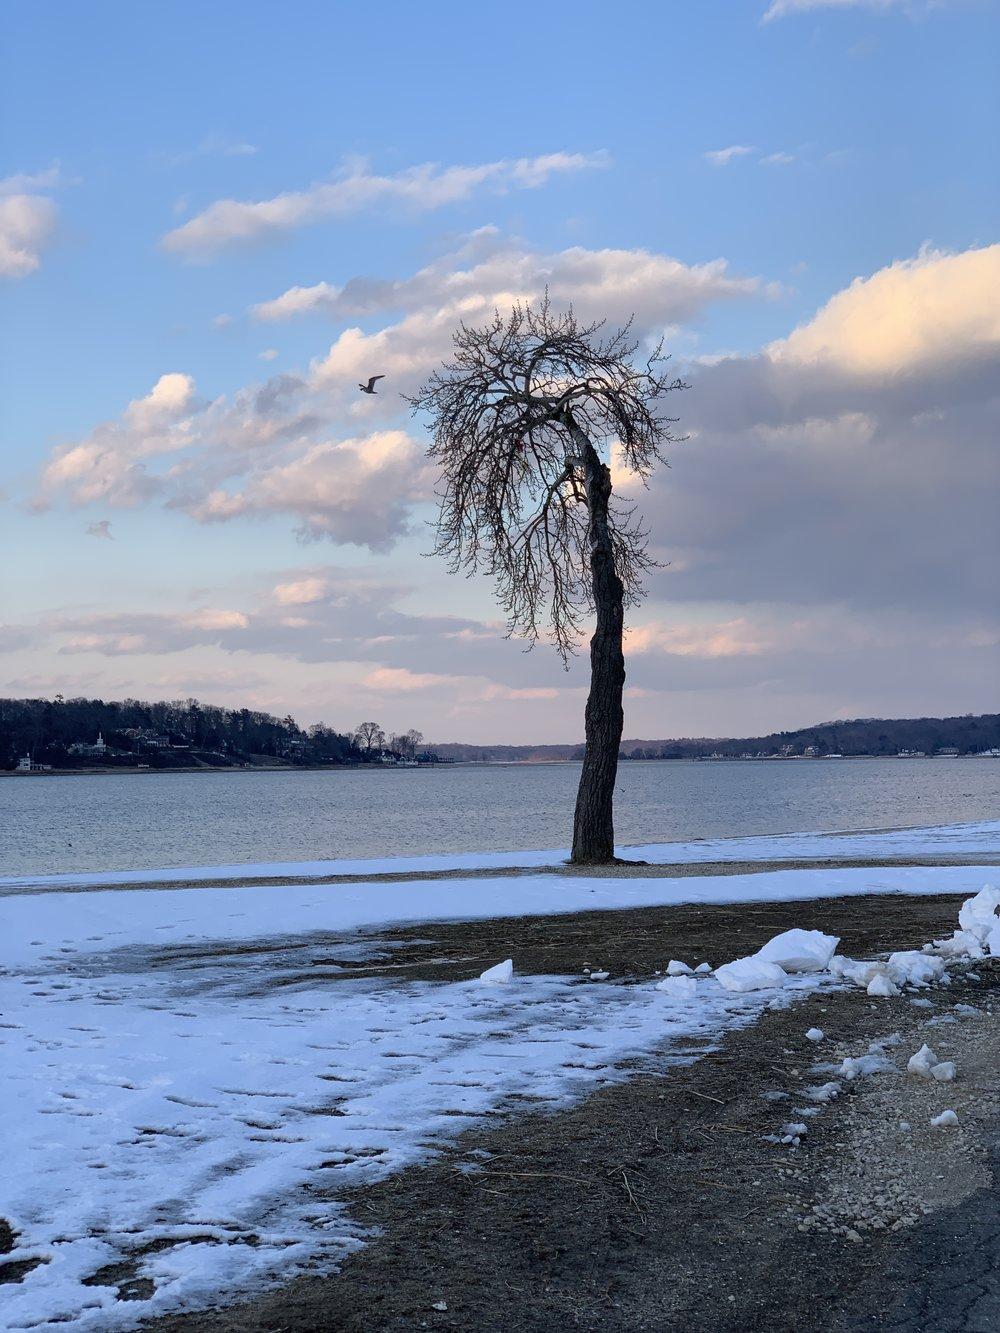 Sad Tree today -